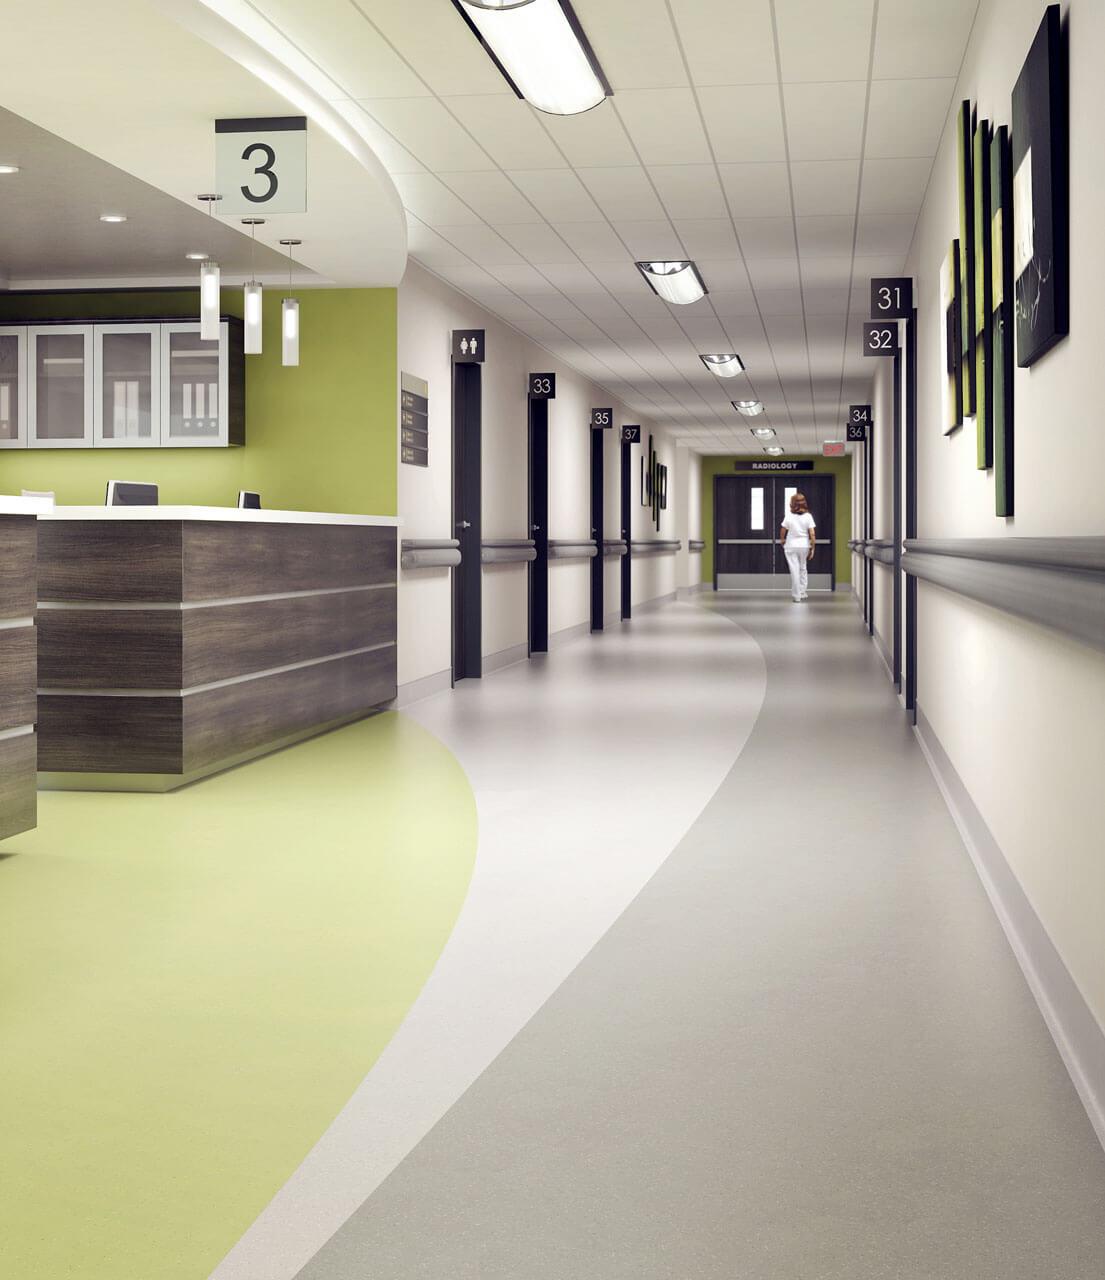 Rubber Flooring in Hospital Corridor